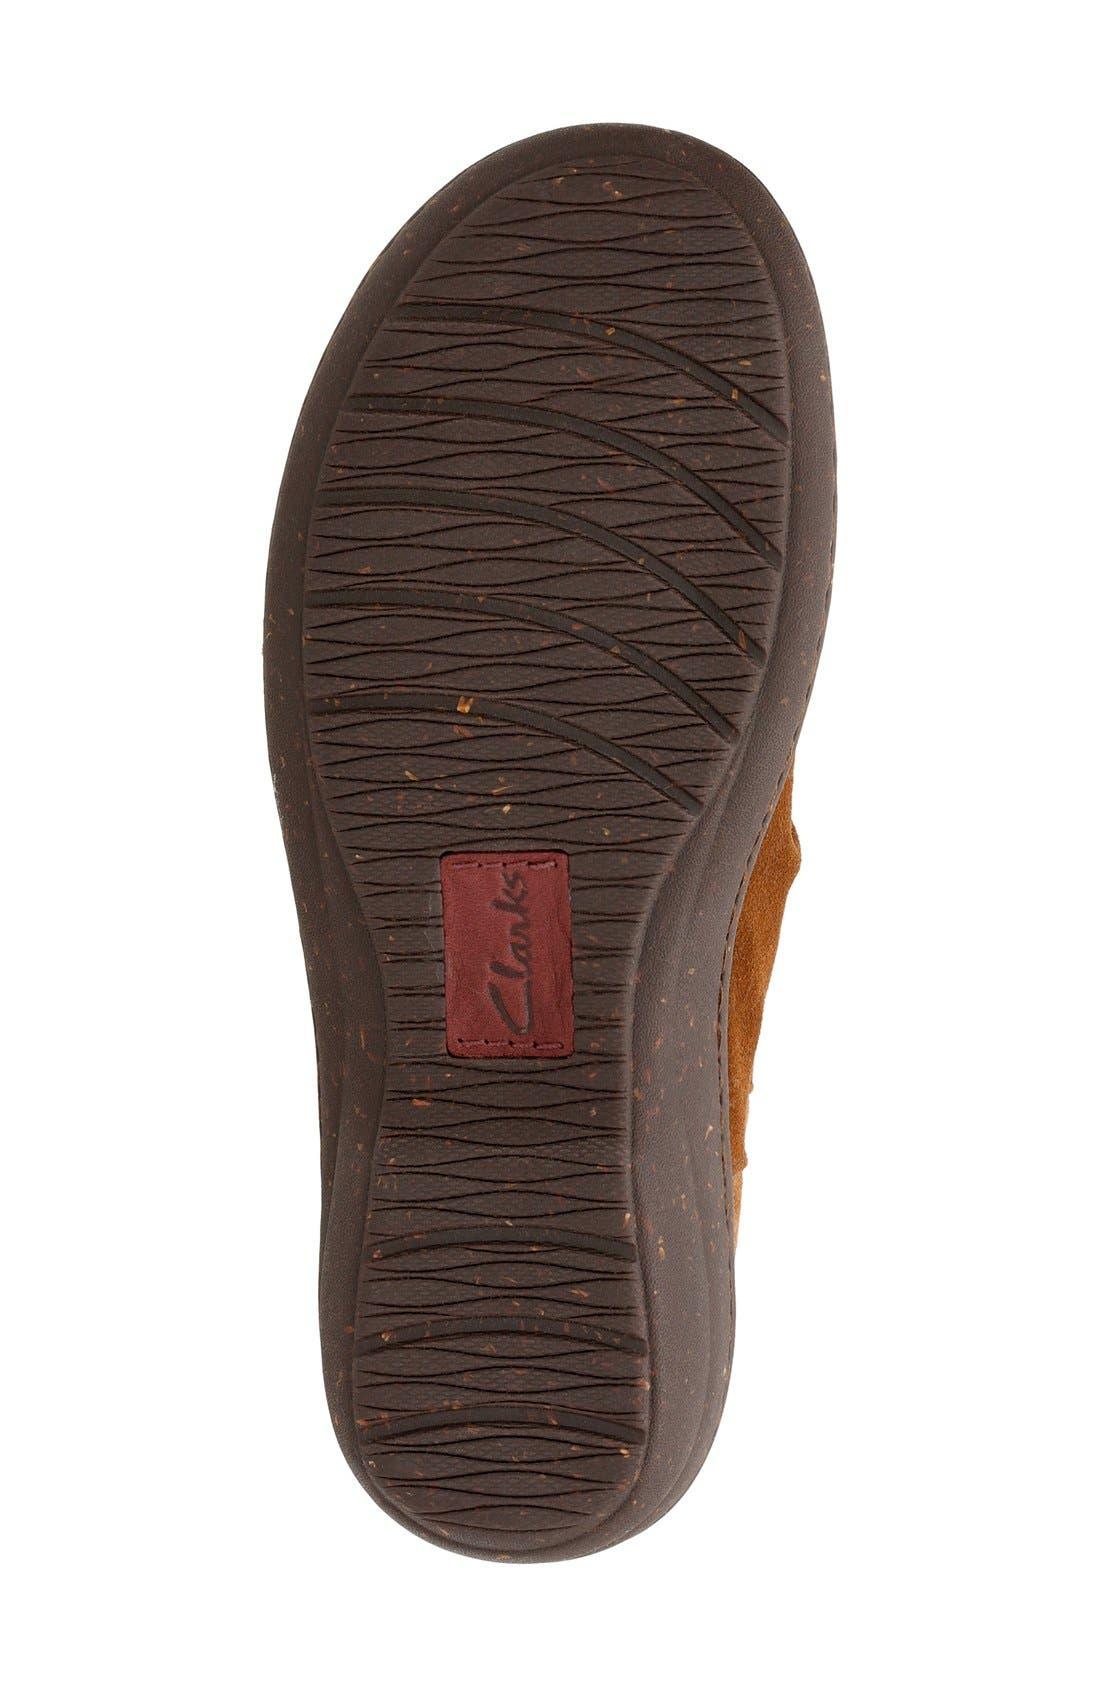 'Avington Swan' Ankle Boot,                             Alternate thumbnail 4, color,                             Tan Suede